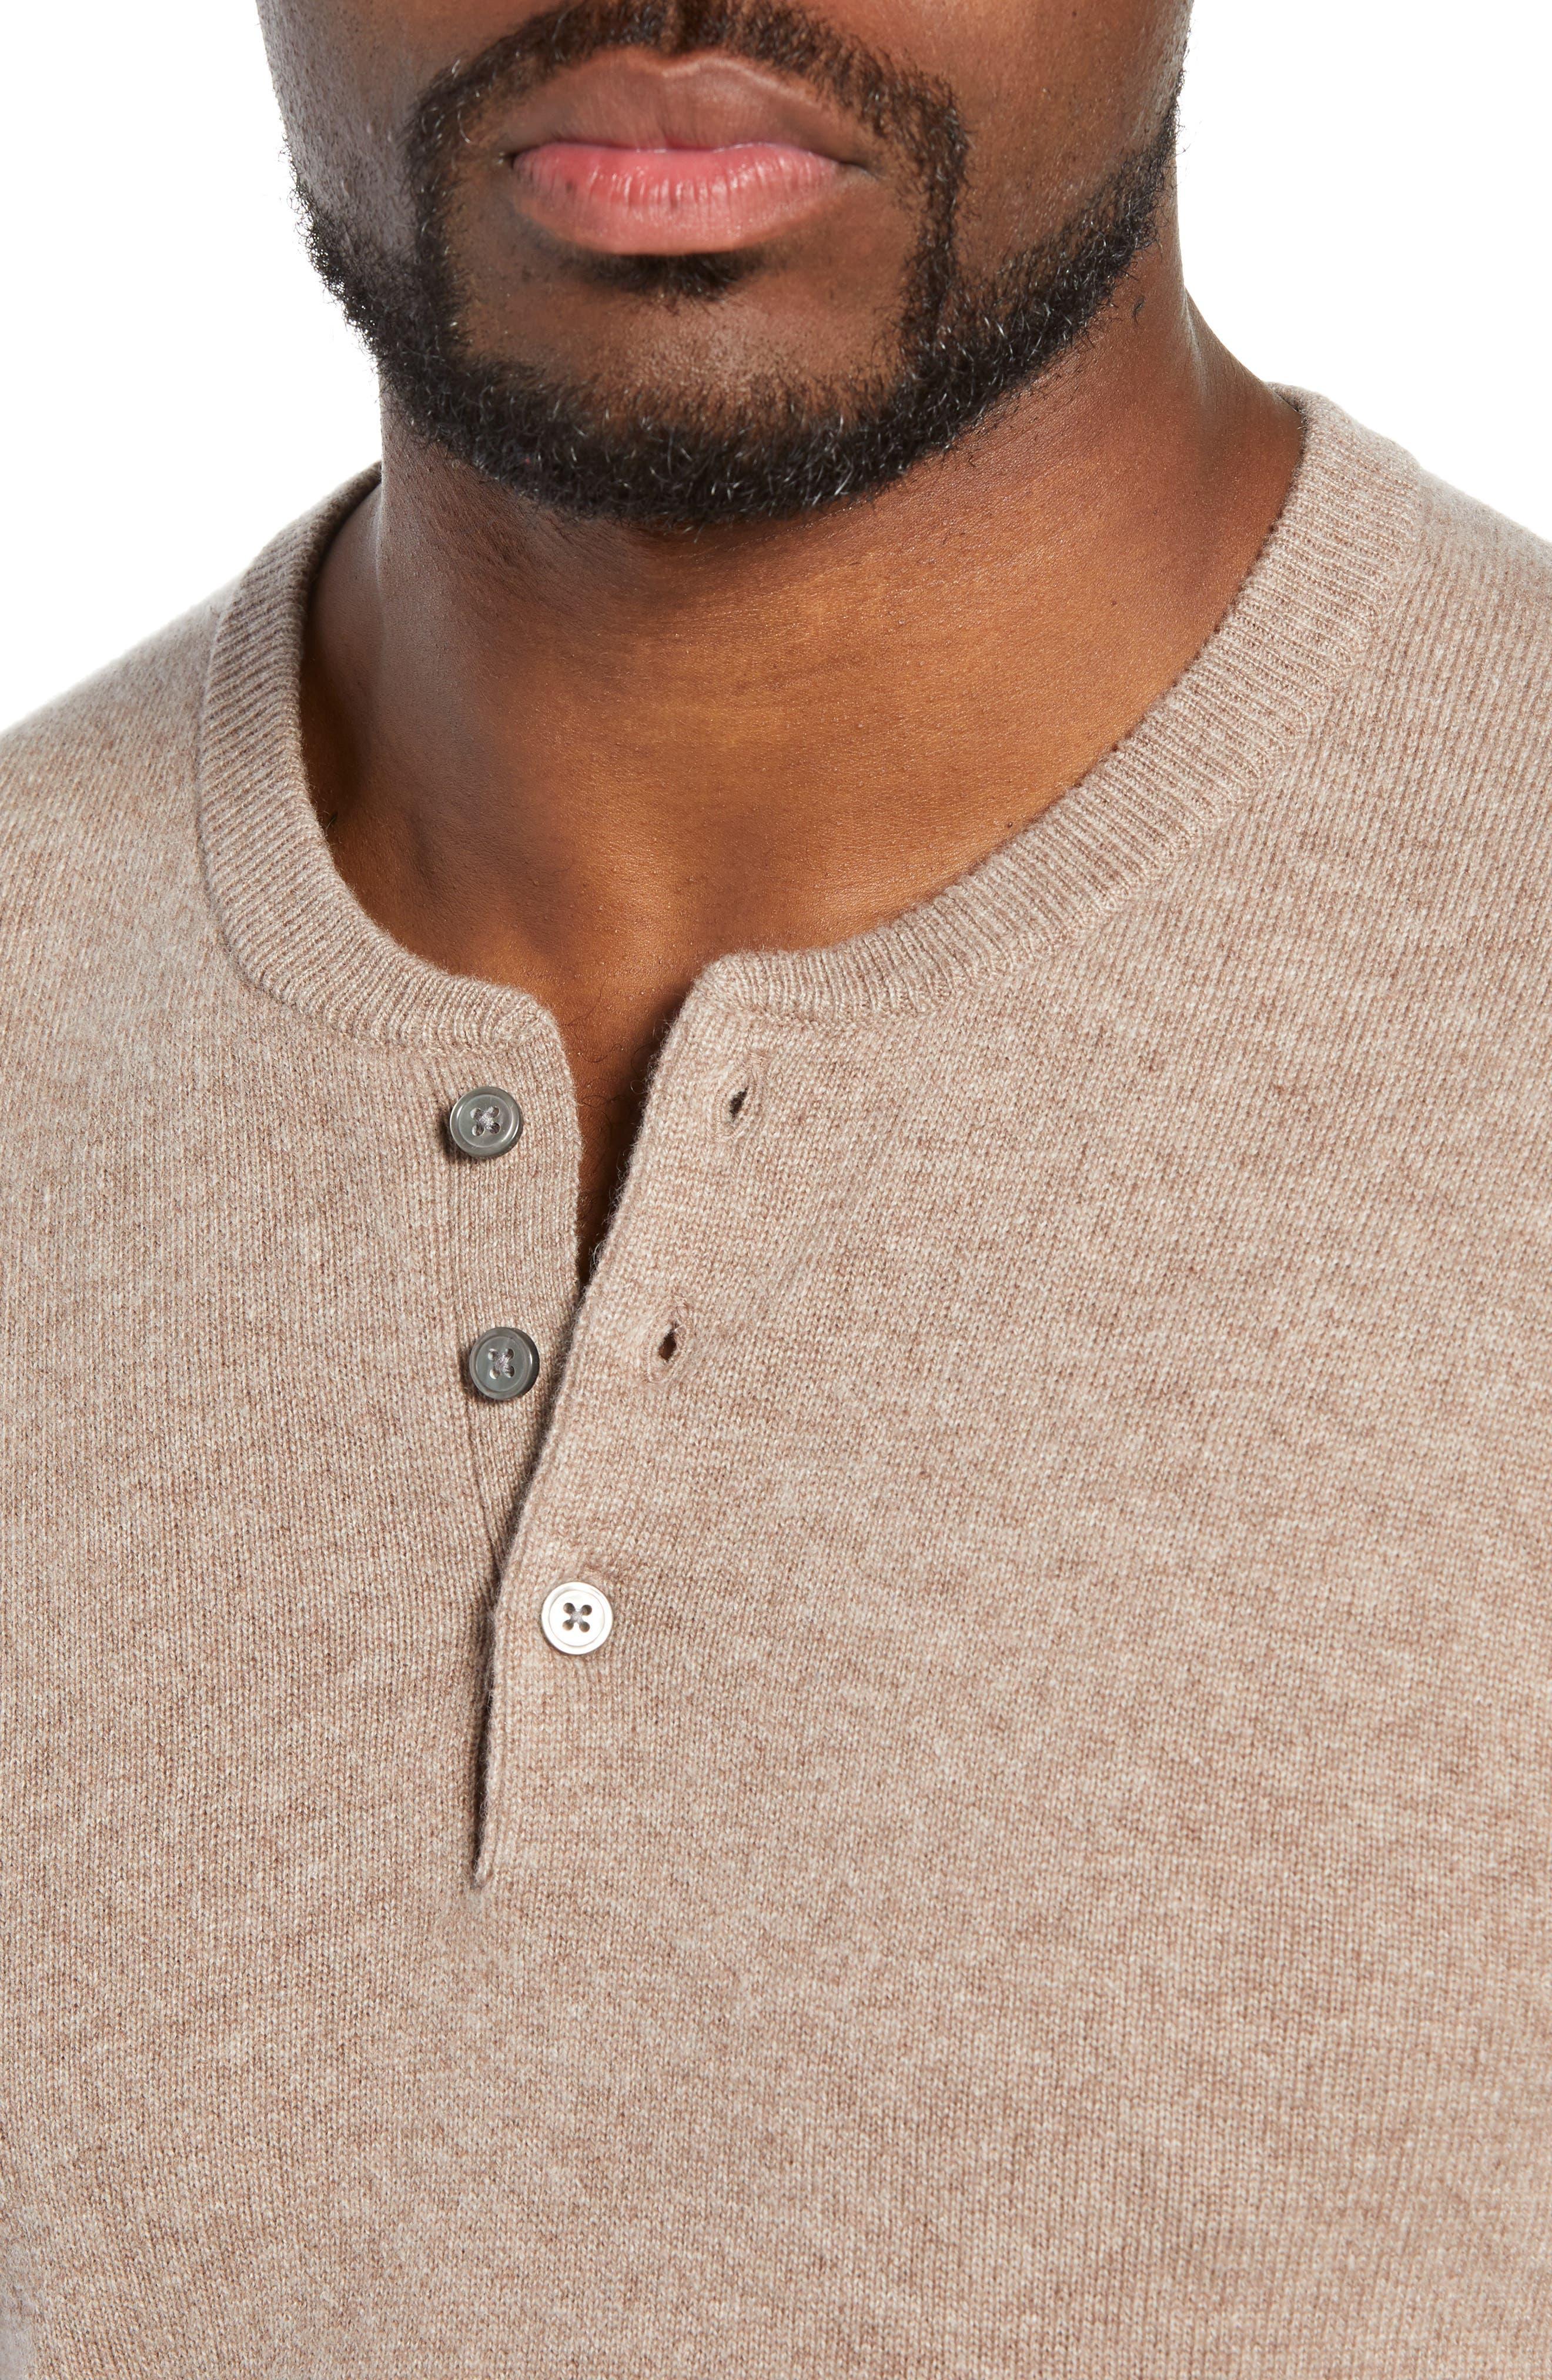 Slim Fit Cashmere Henley Sweater,                             Alternate thumbnail 4, color,                             200